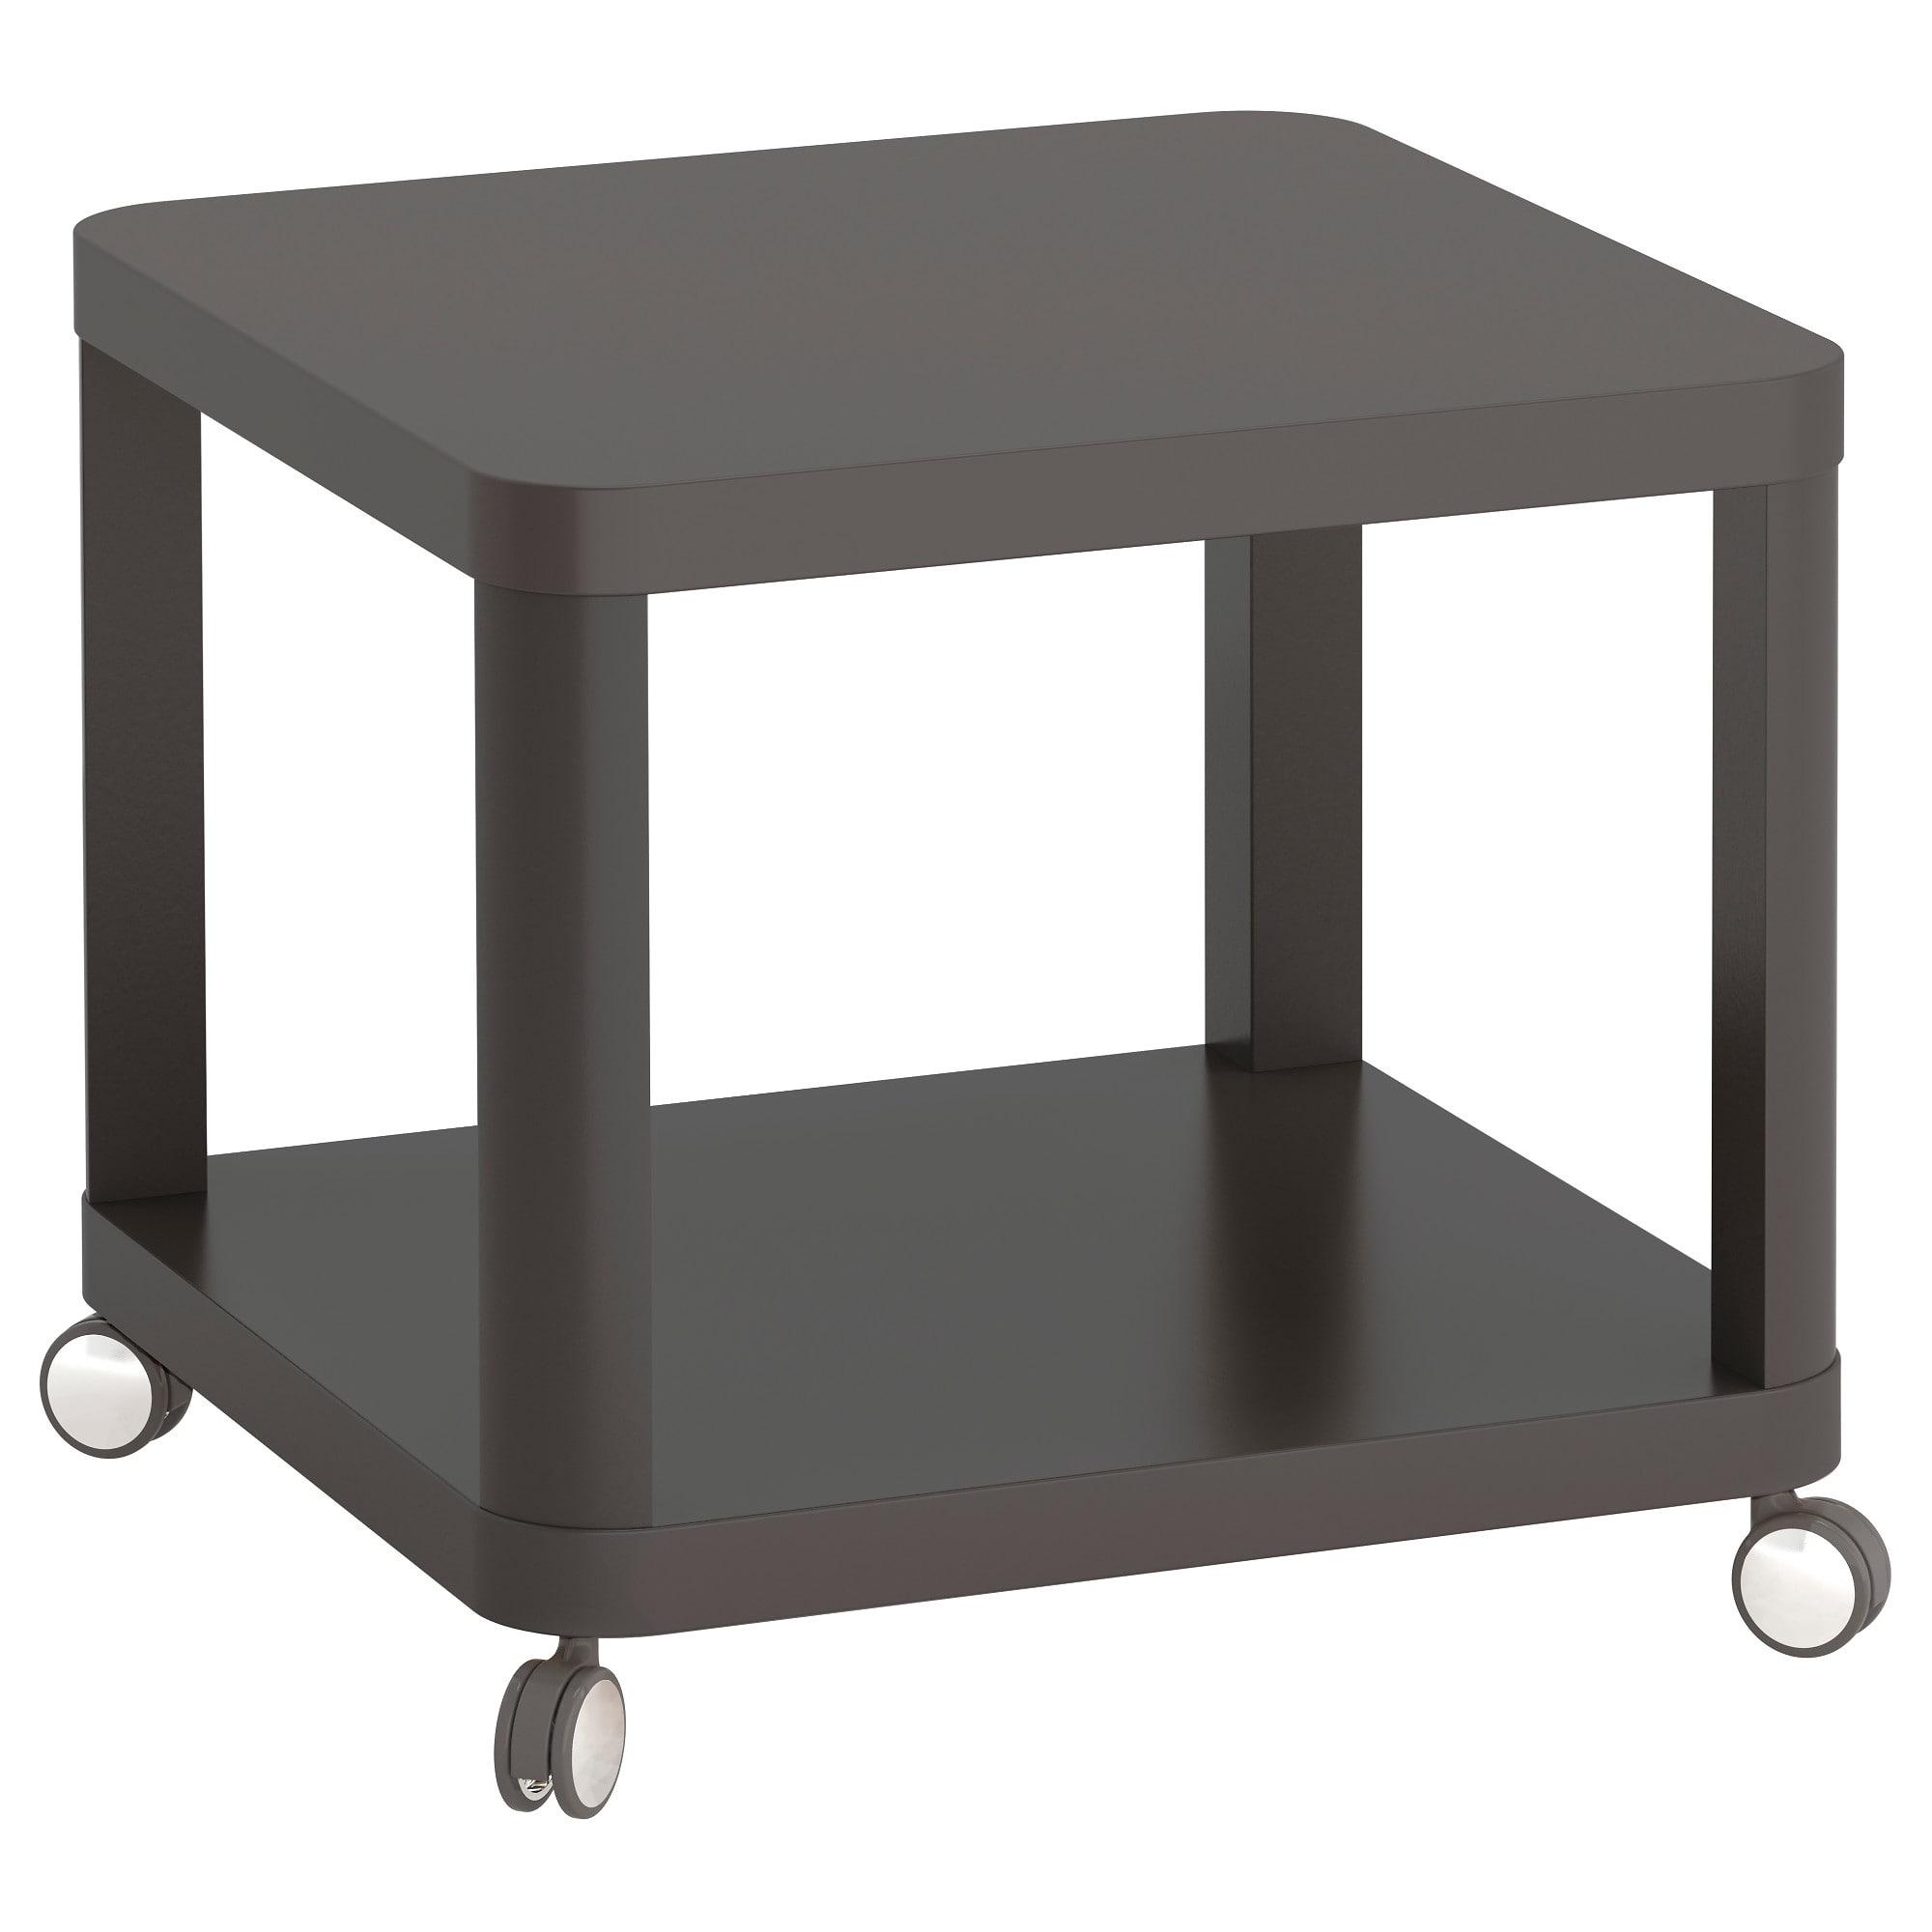 Mesita Comedor Whdr Mesas De Centro Y Mesas Auxiliares Pra Online Ikea